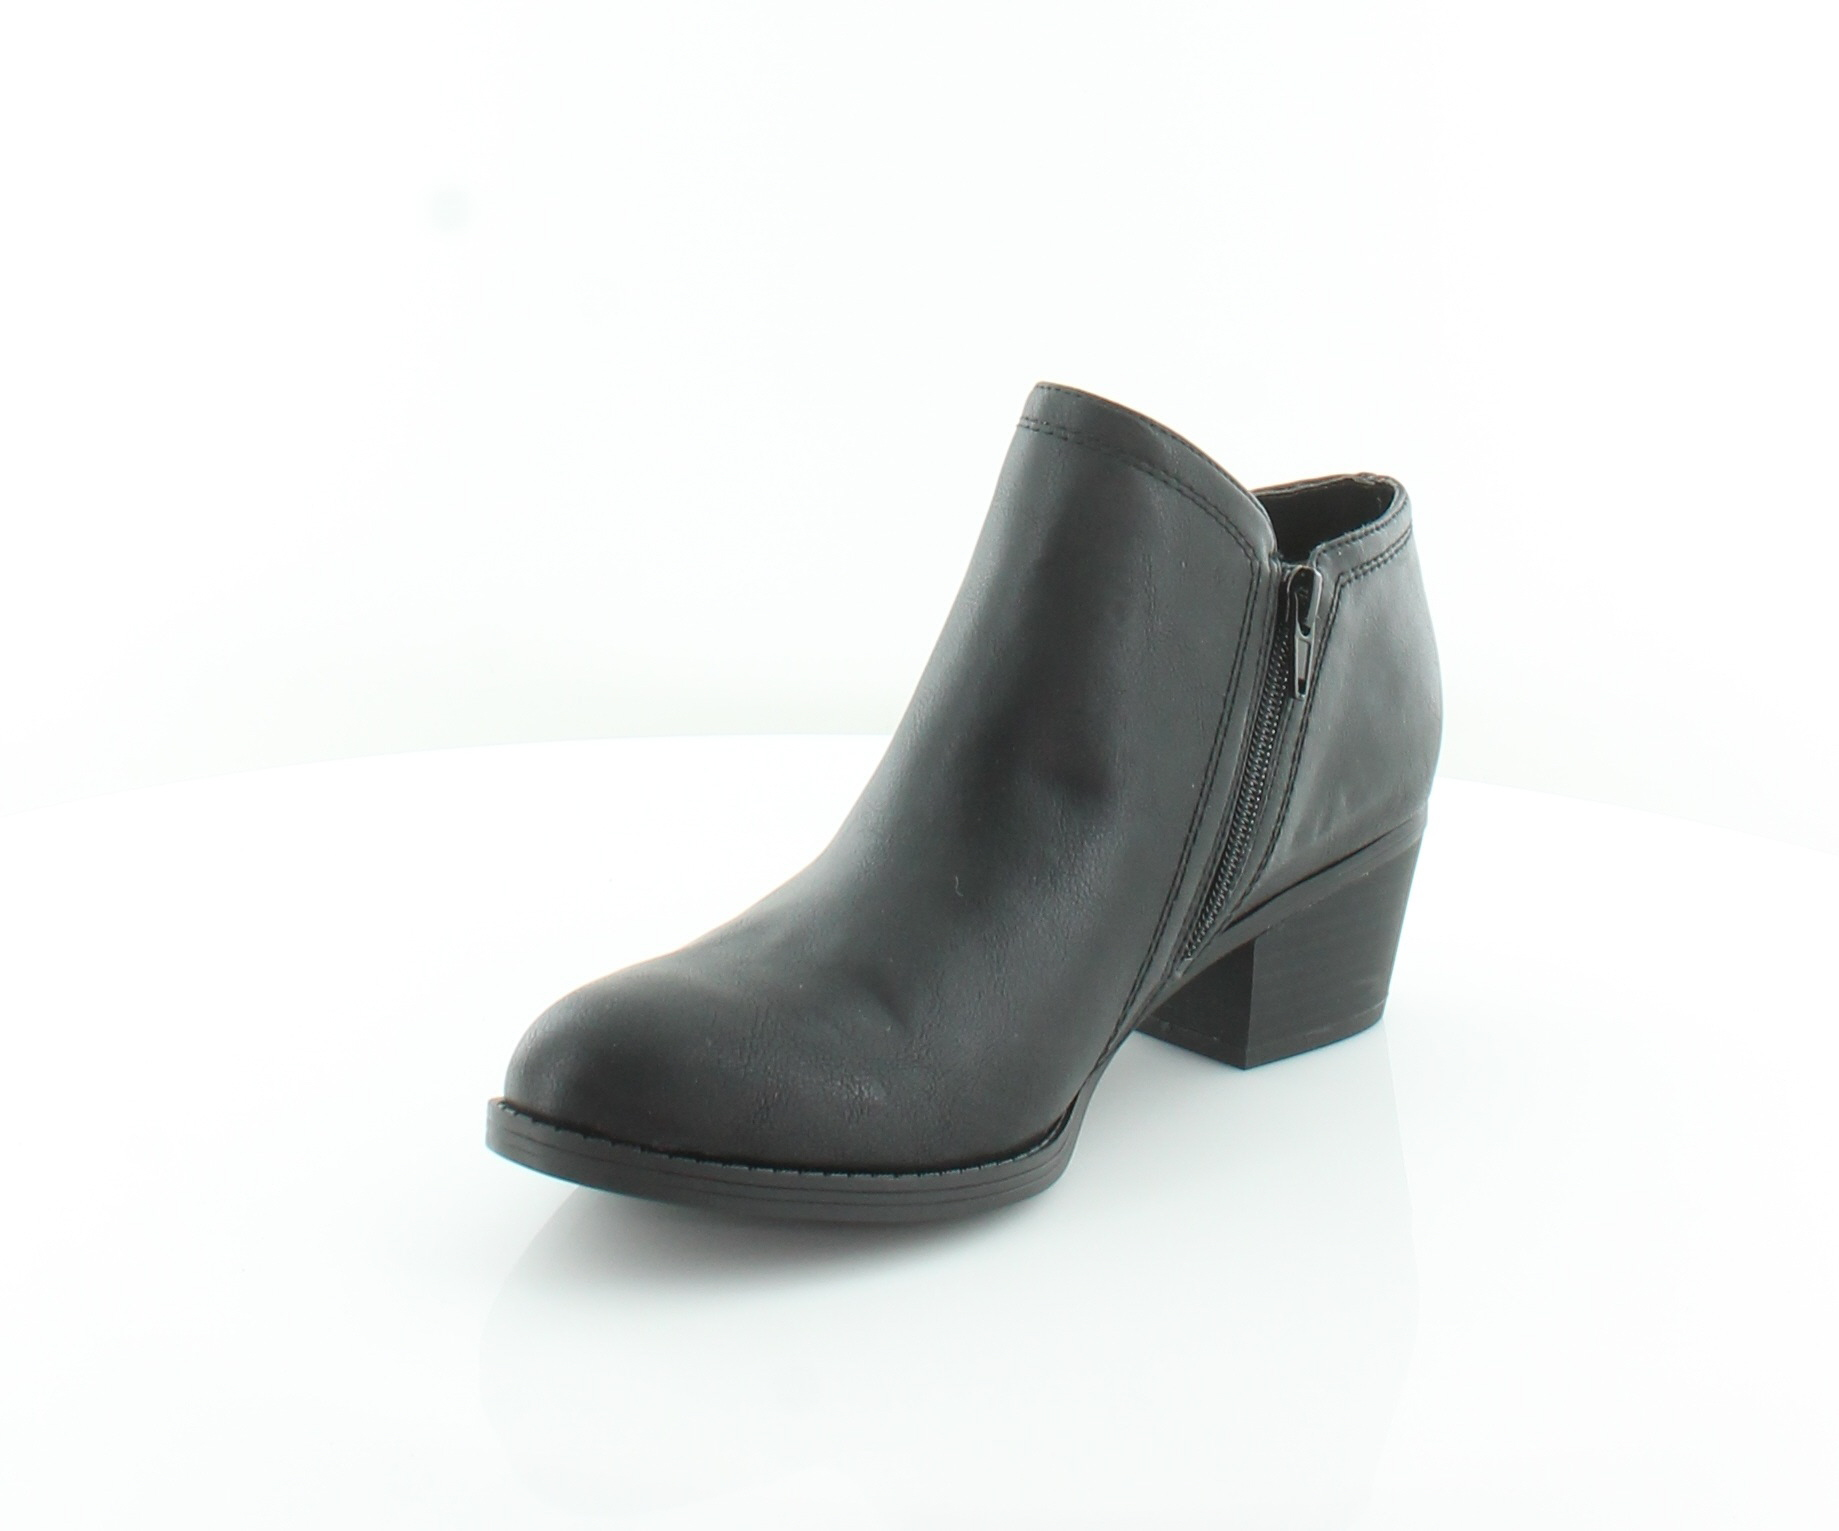 Naturalizer-Wonda2-Women-039-s-Boots-Black thumbnail 2